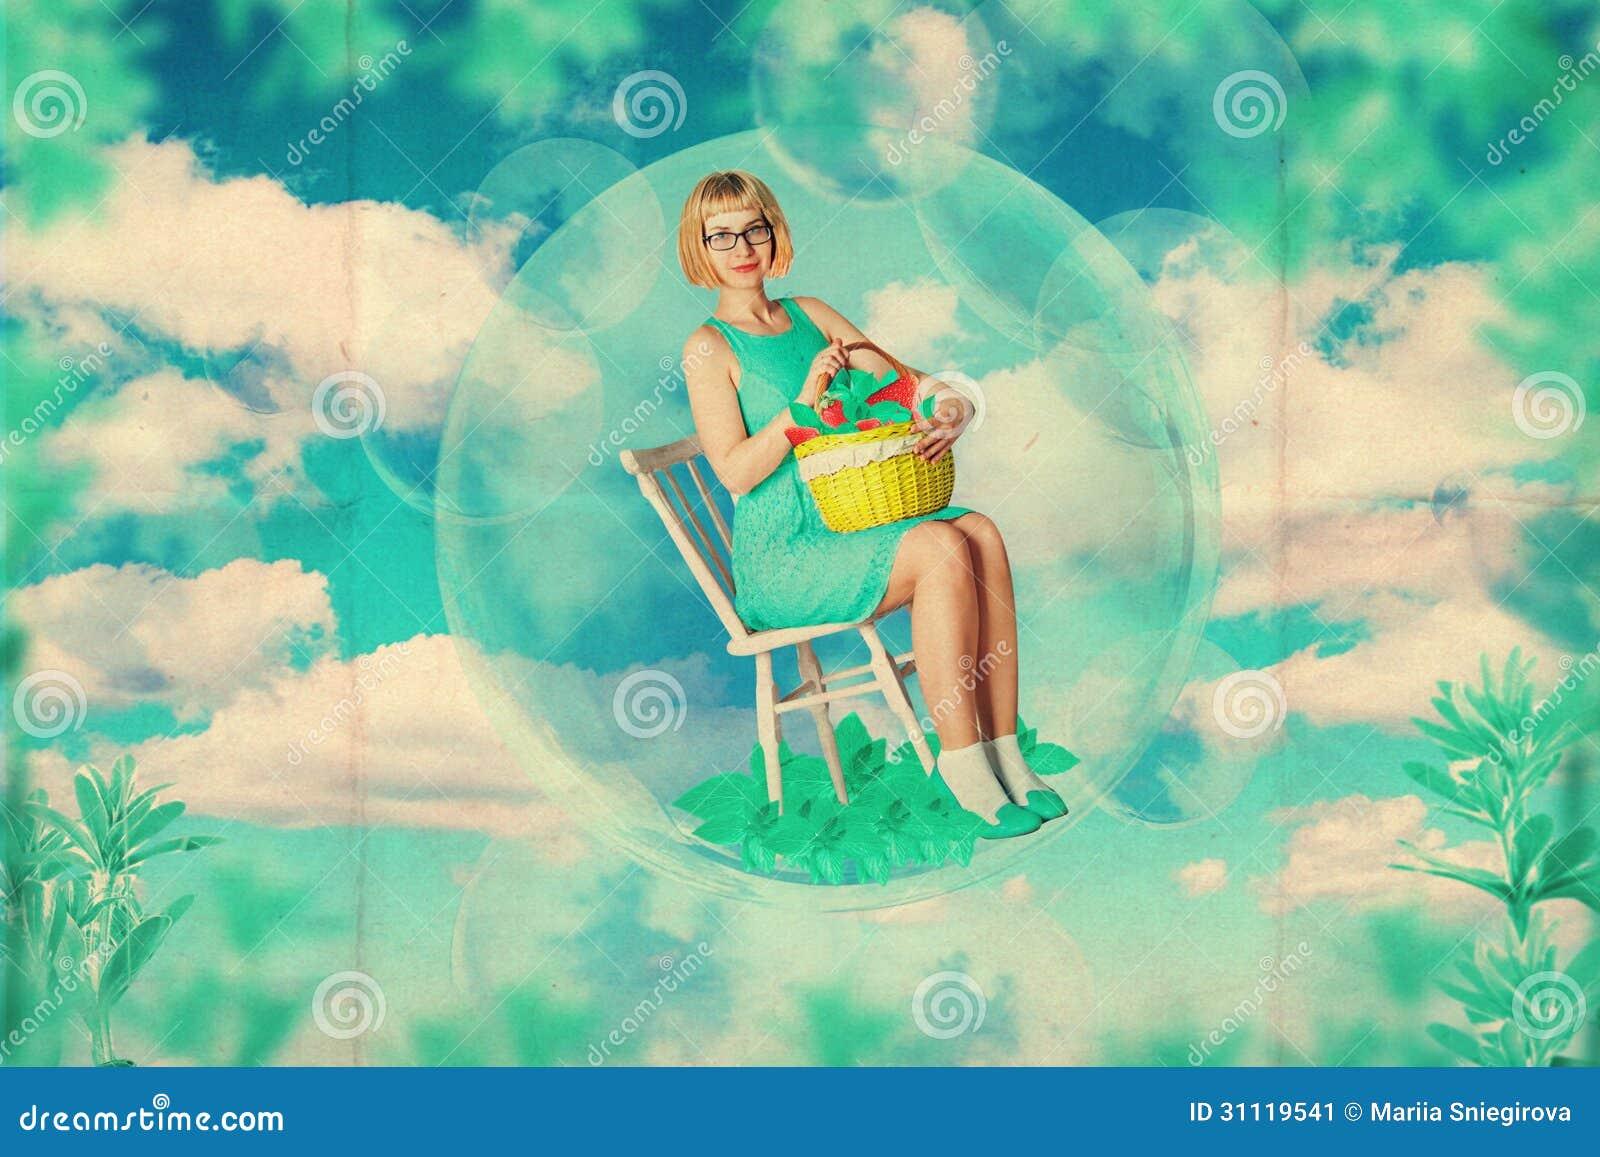 Art collage with beautiful woman creative work stock for Beautiful creative art